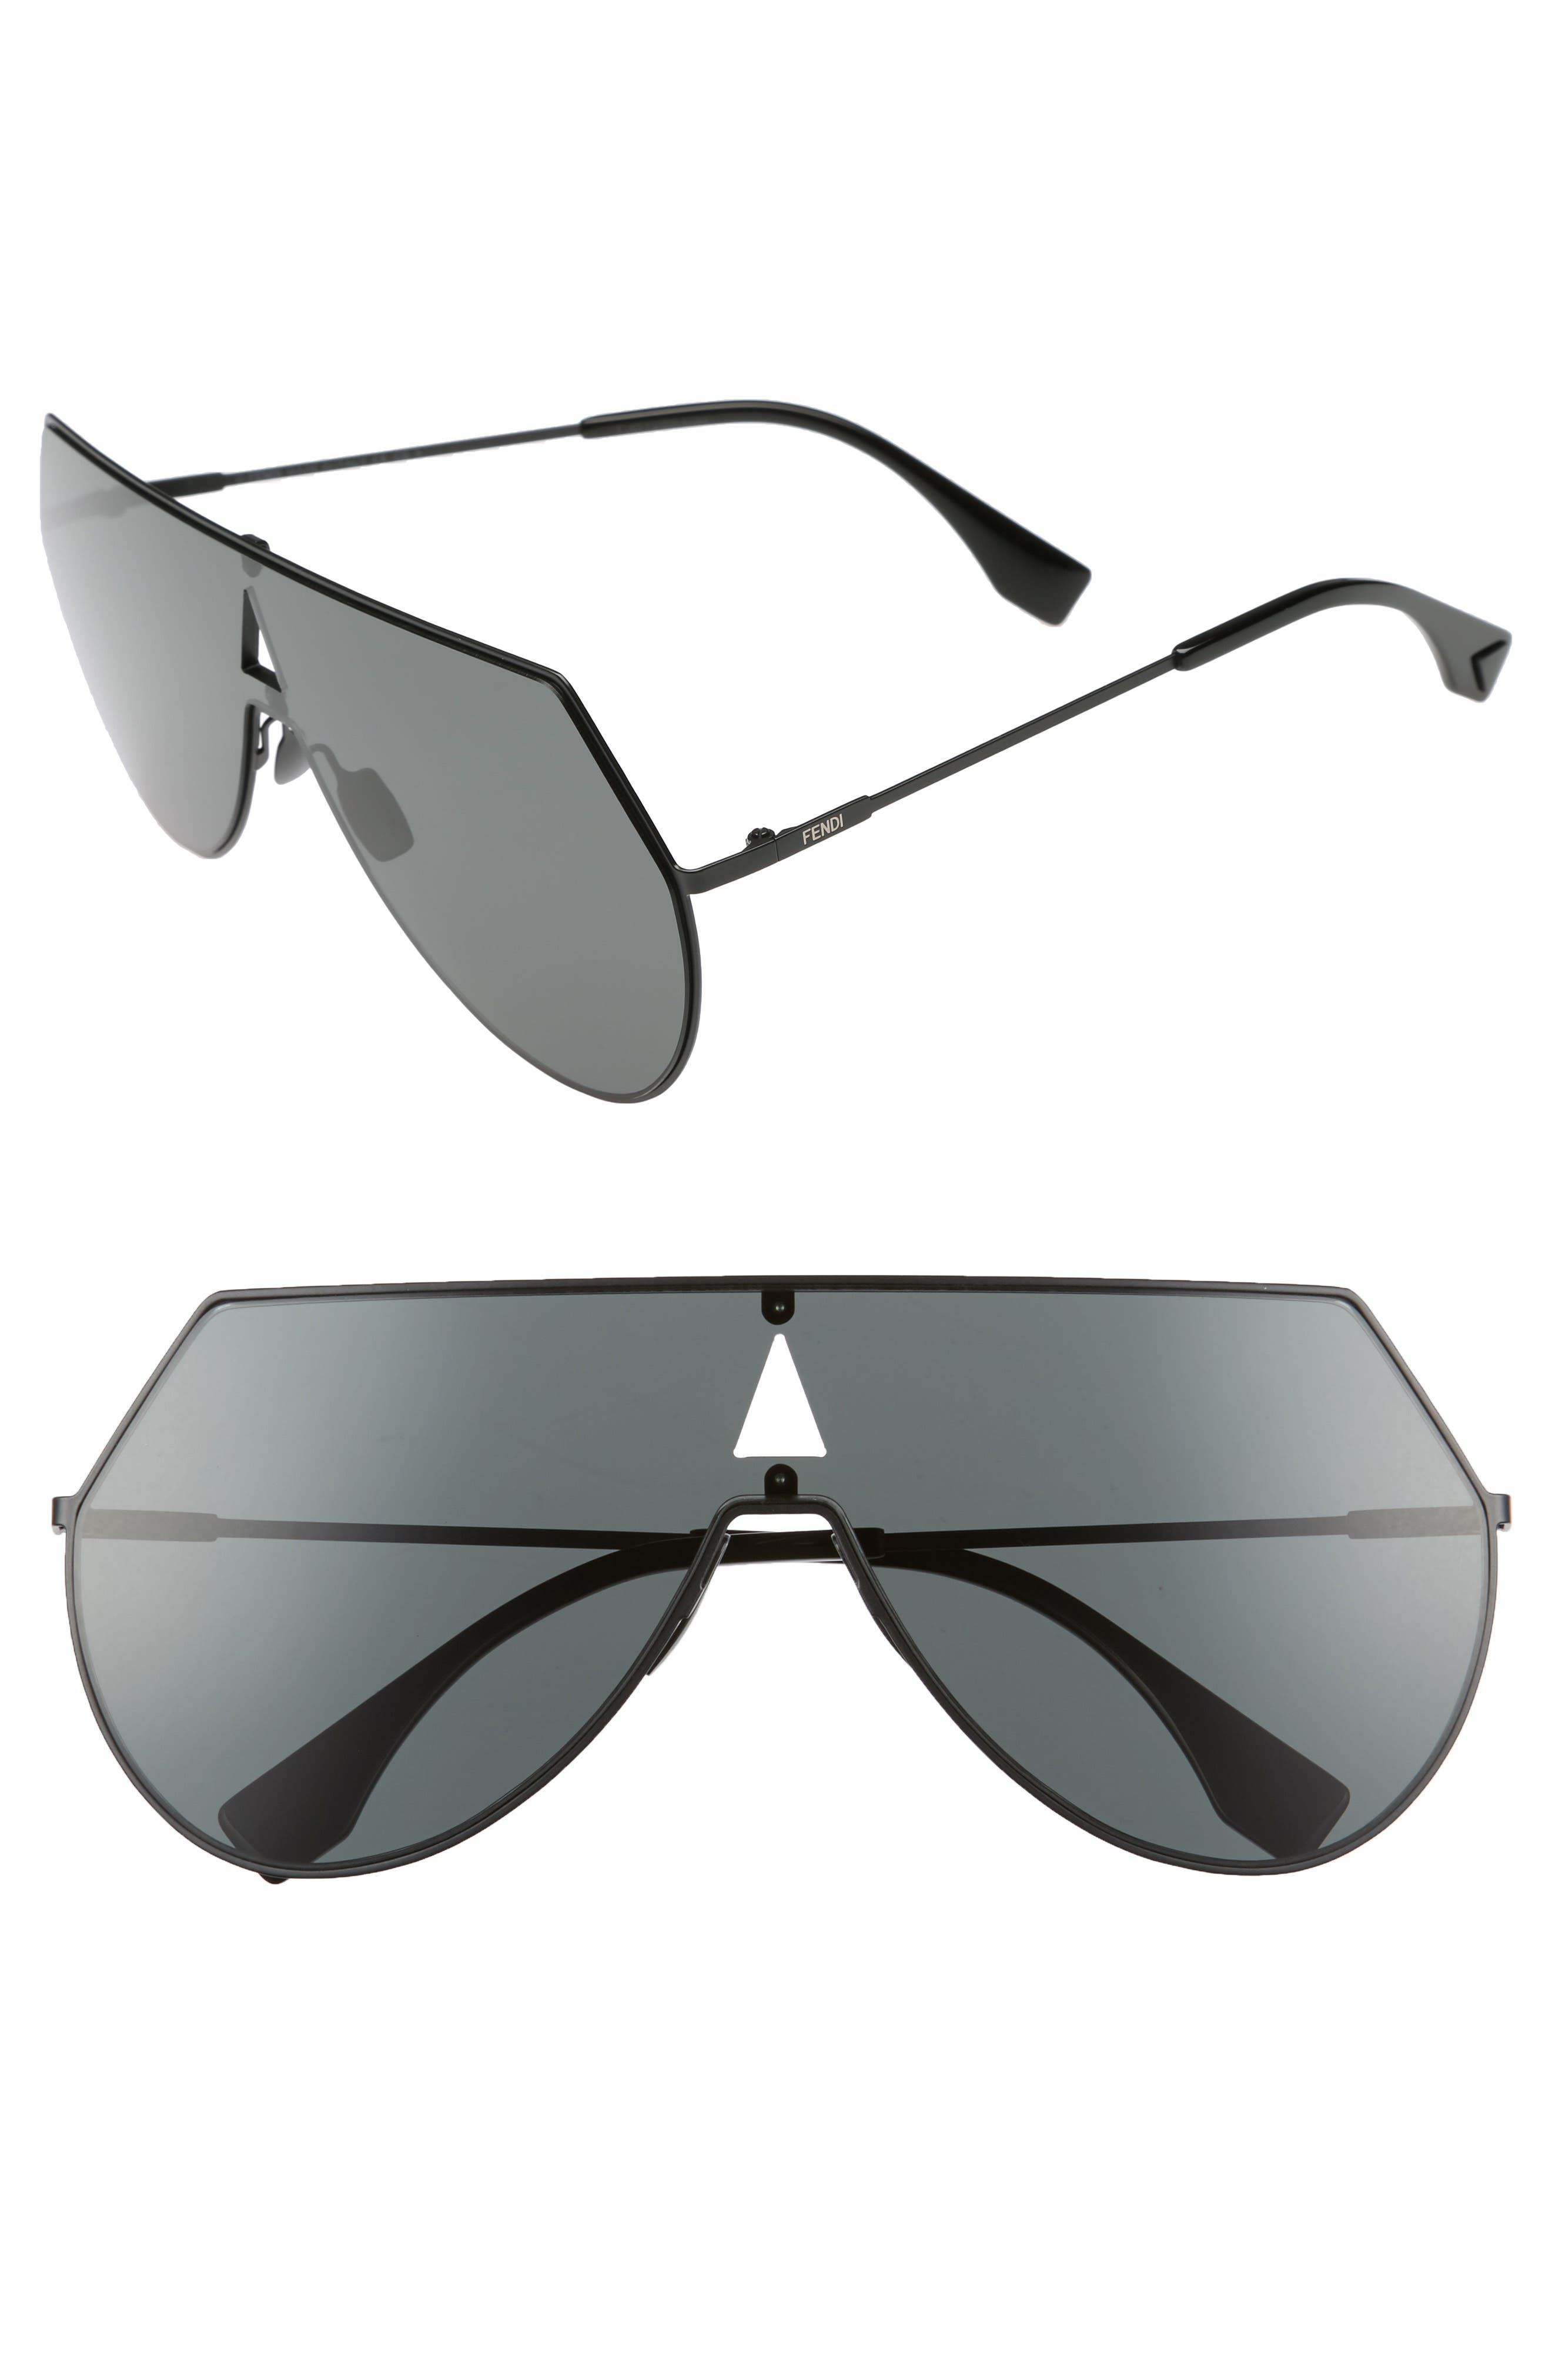 99mm Eyeline Aviator Sunglasses,                         Main,                         color, Black